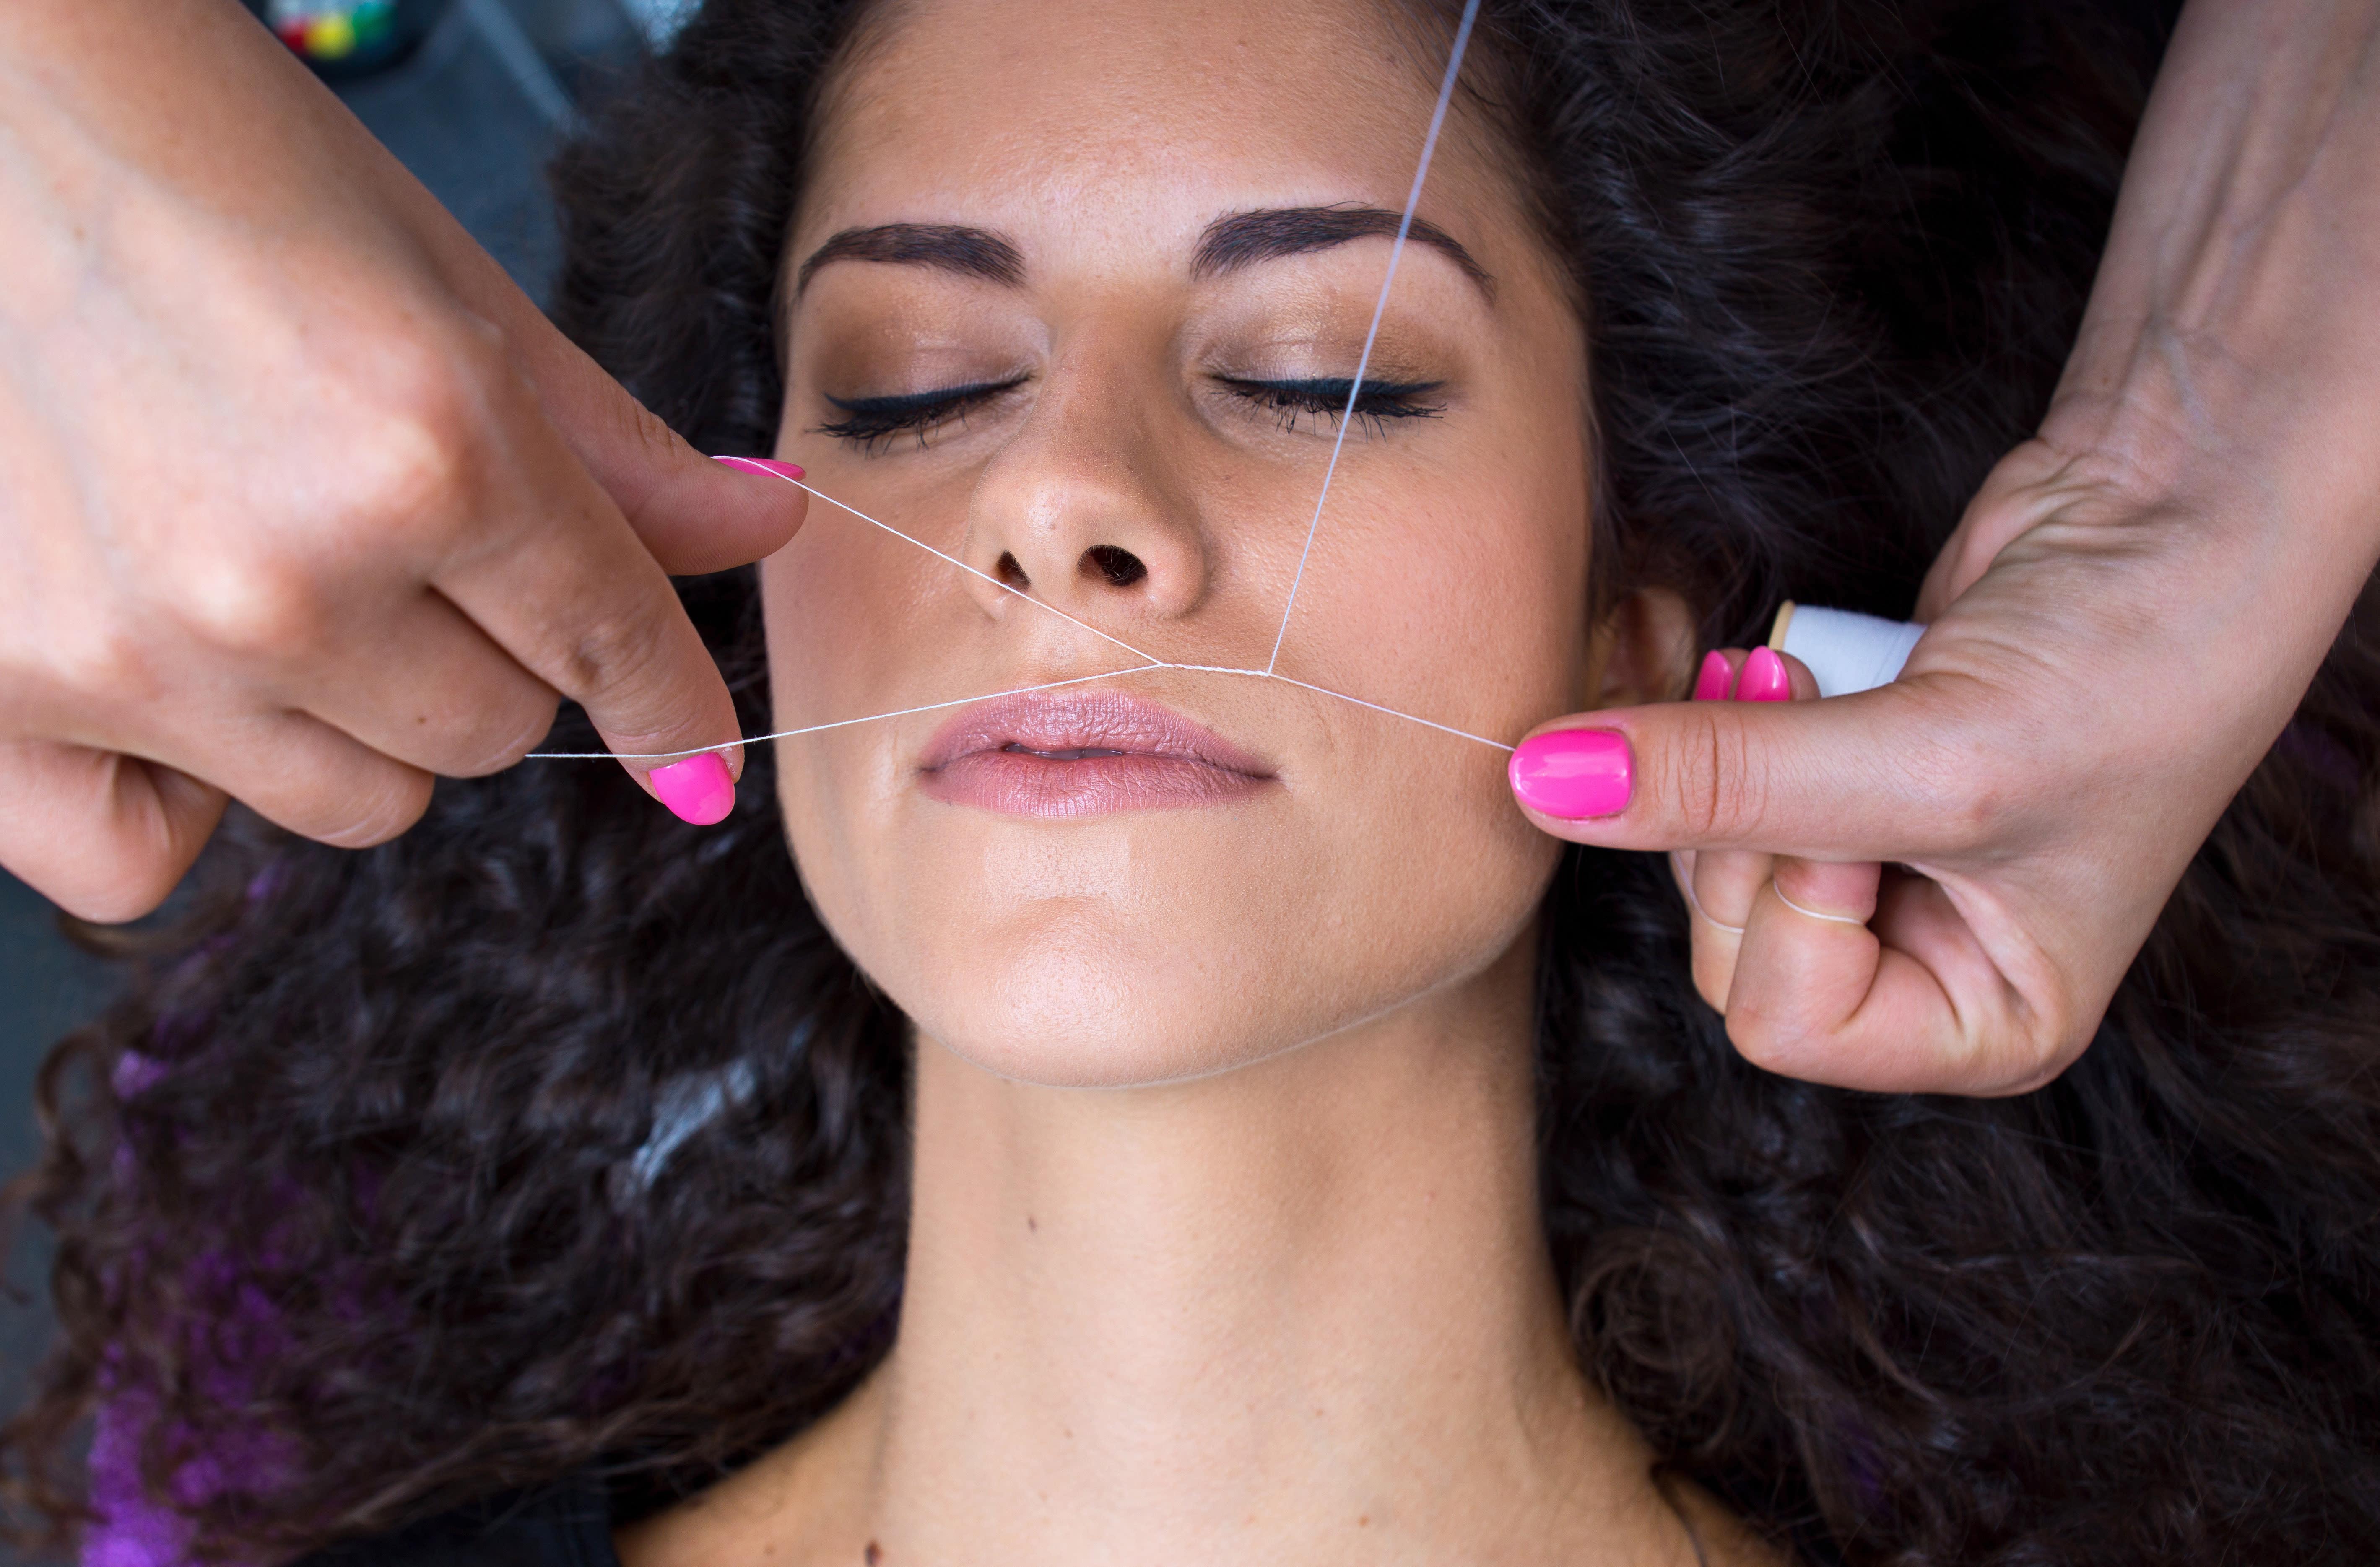 facial-hair-nj-salon